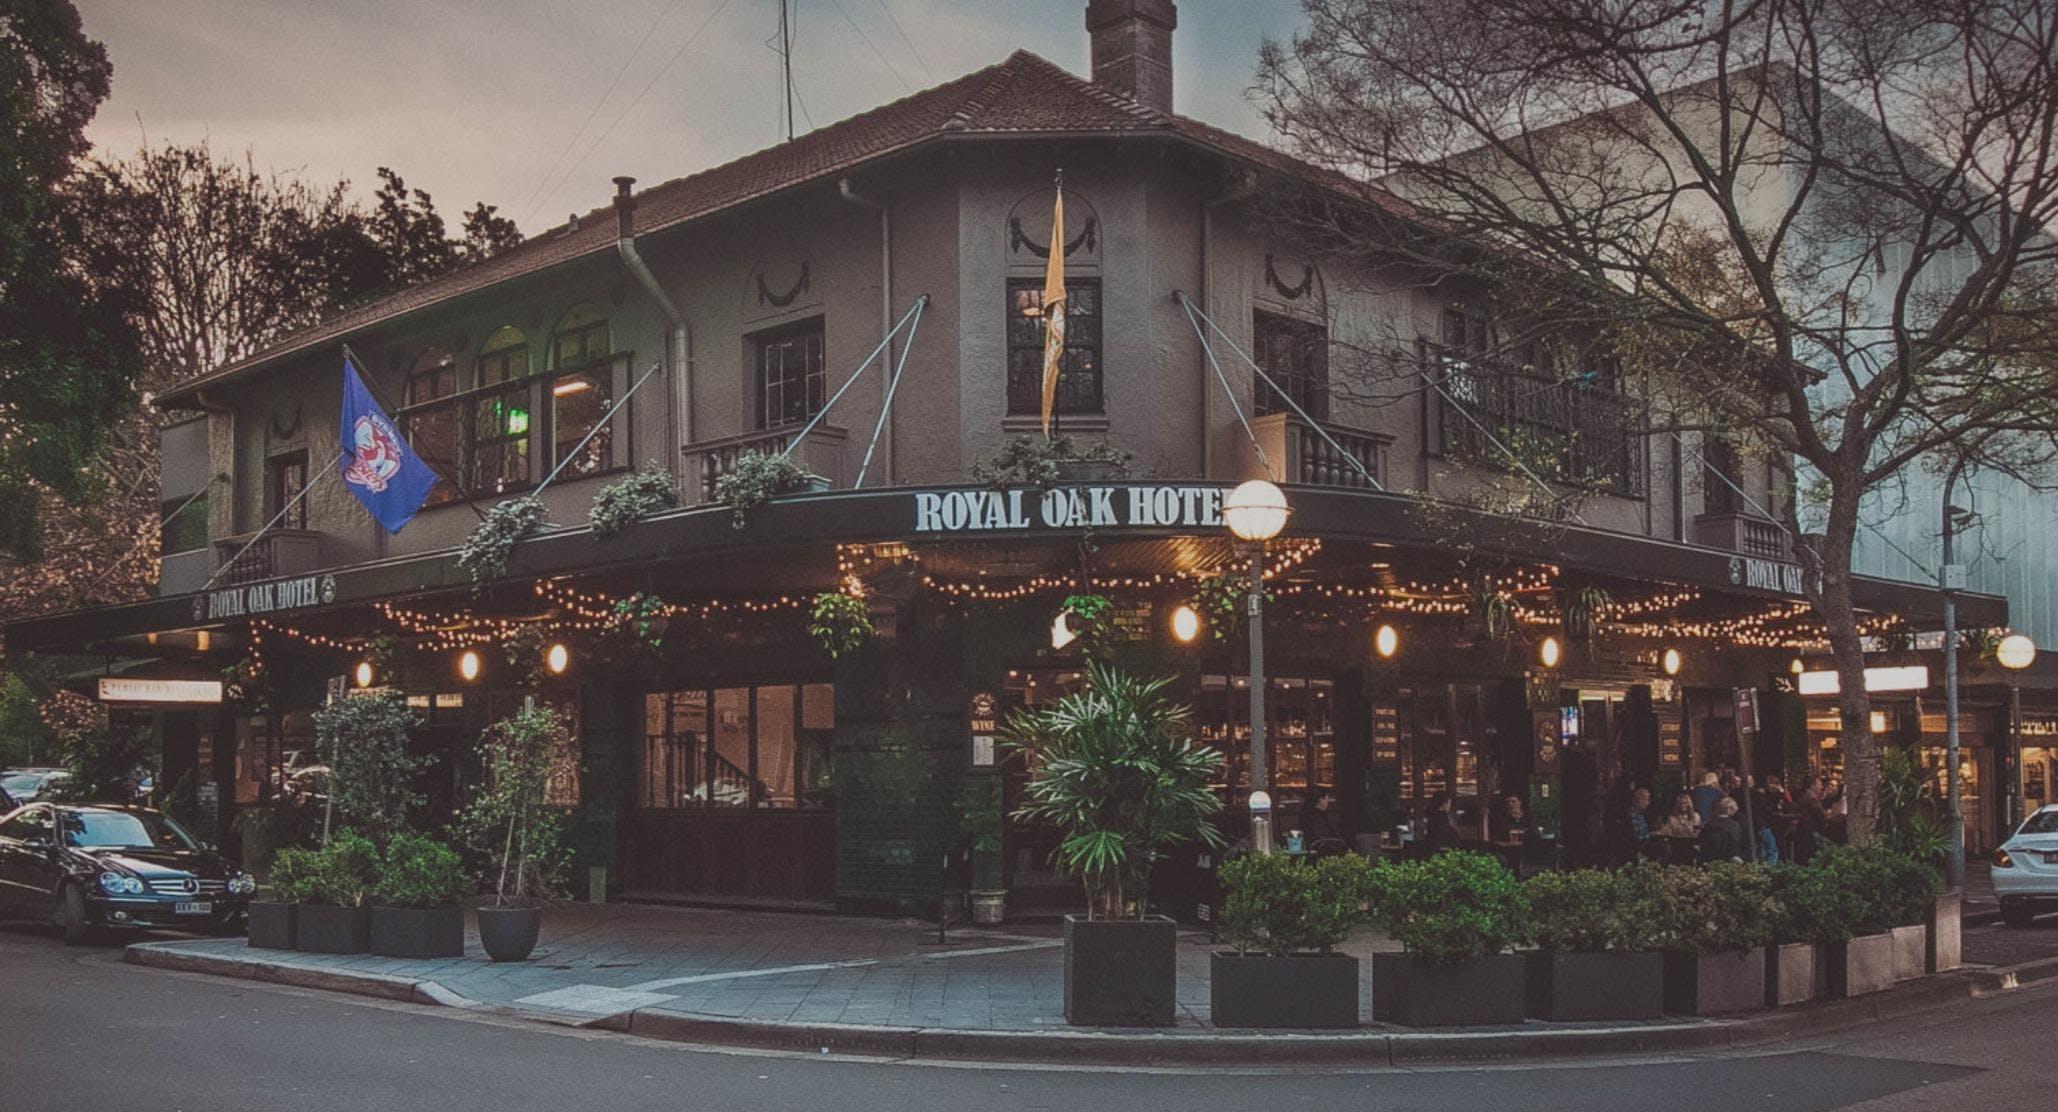 The Royal Oak Hotel - Double Bay Sydney image 1